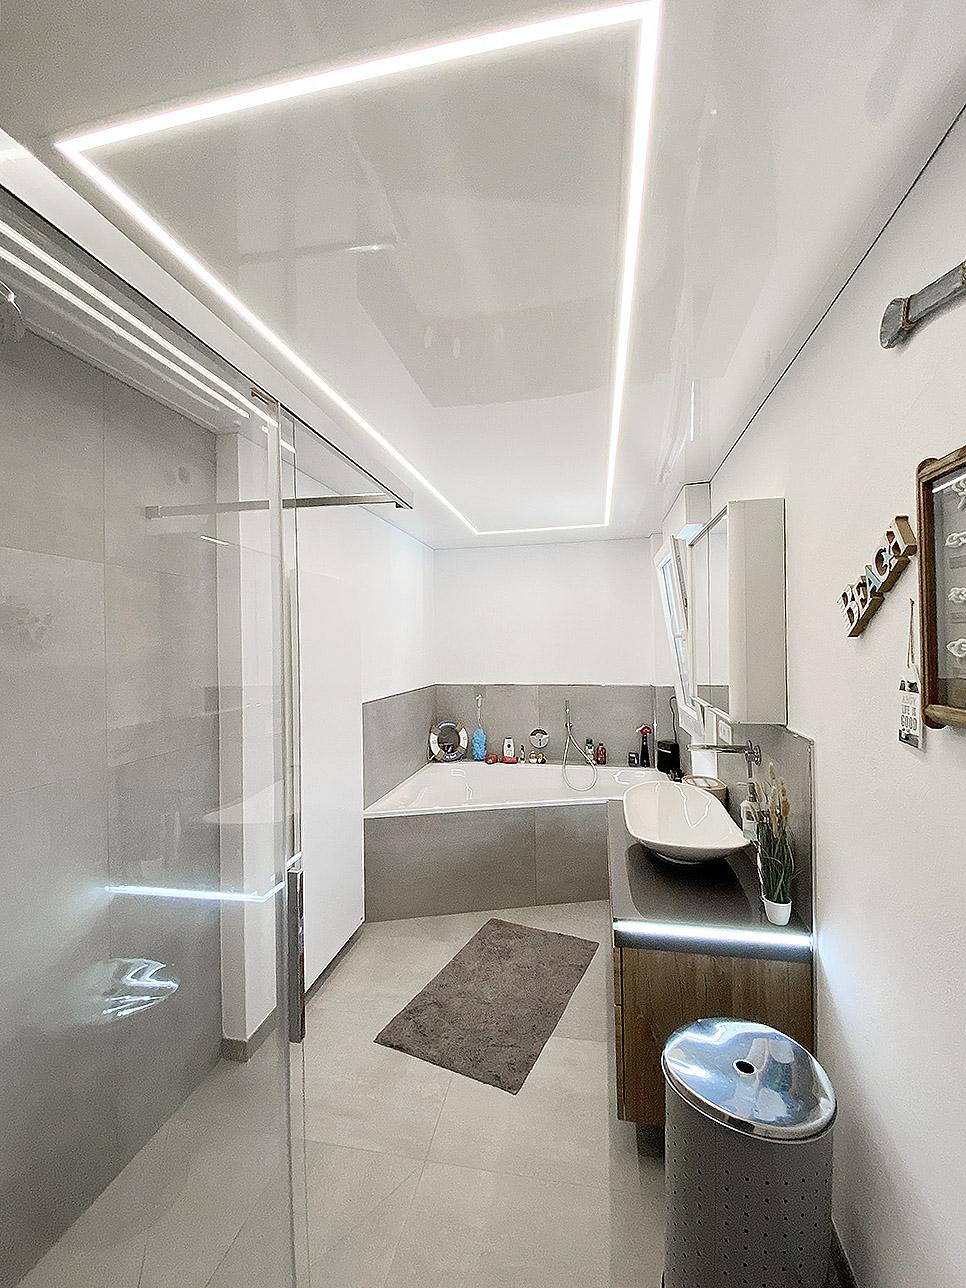 Badezimmer mit LED-Beleuchtung im Aluprofil